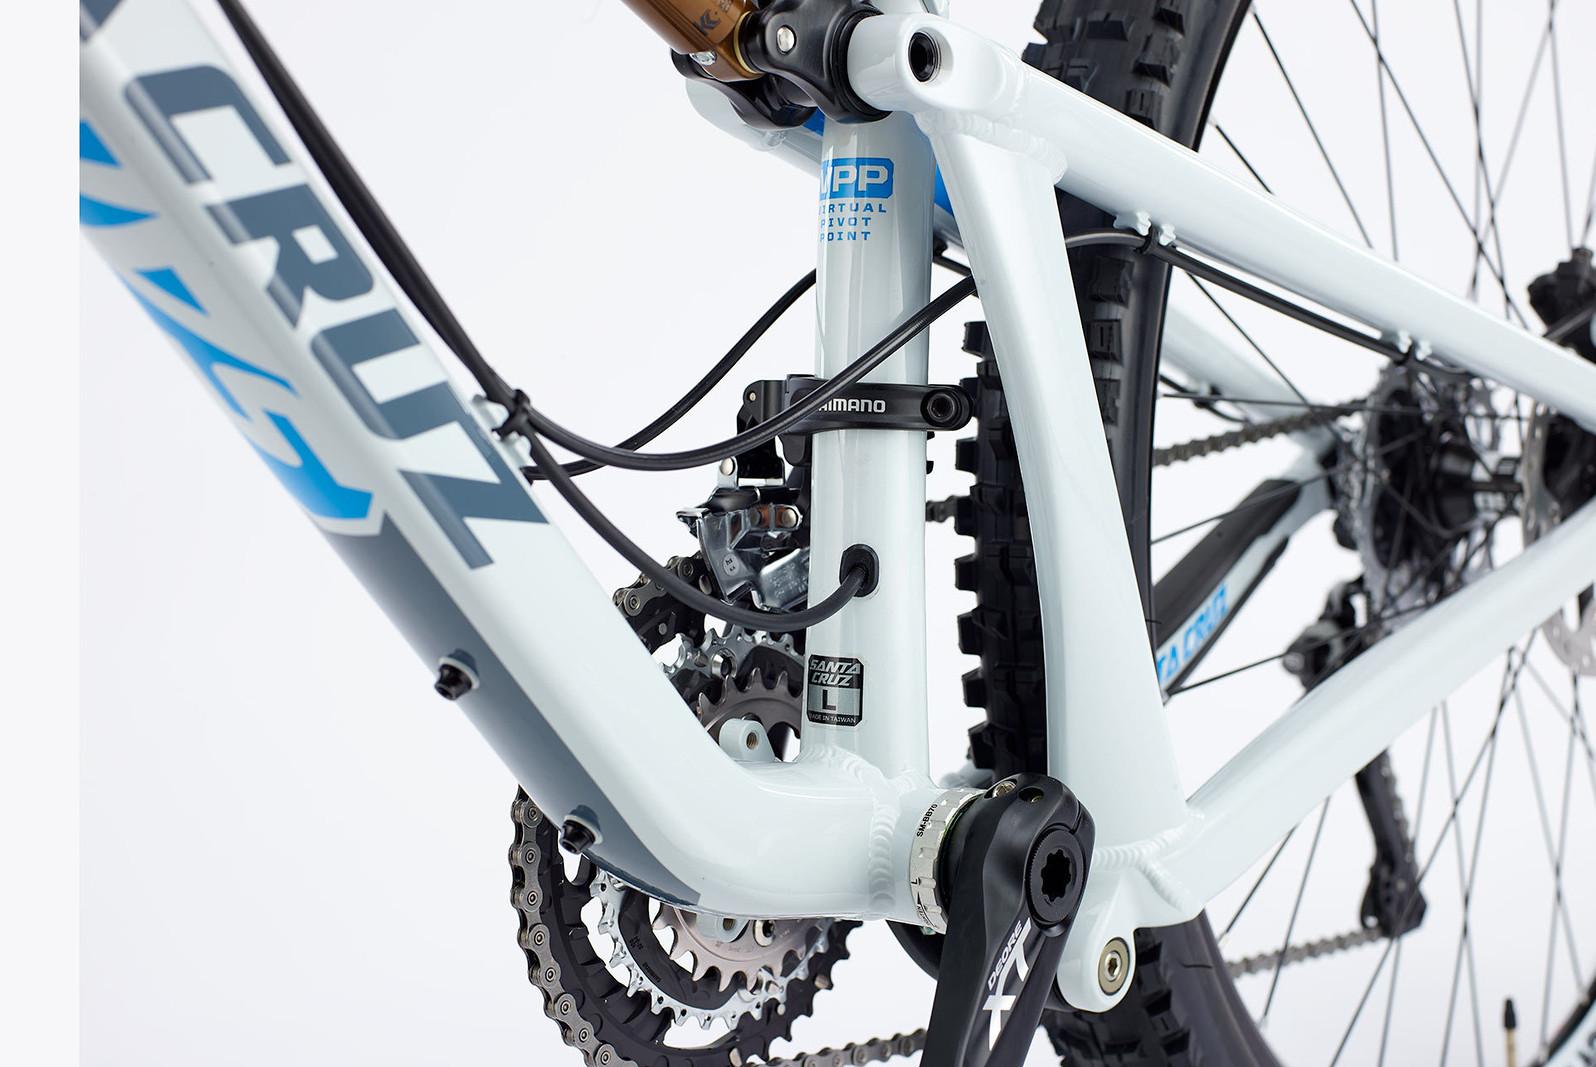 2014 Santa Cruz Bronson R AM Bike - Reviews, Comparisons, Specs ...